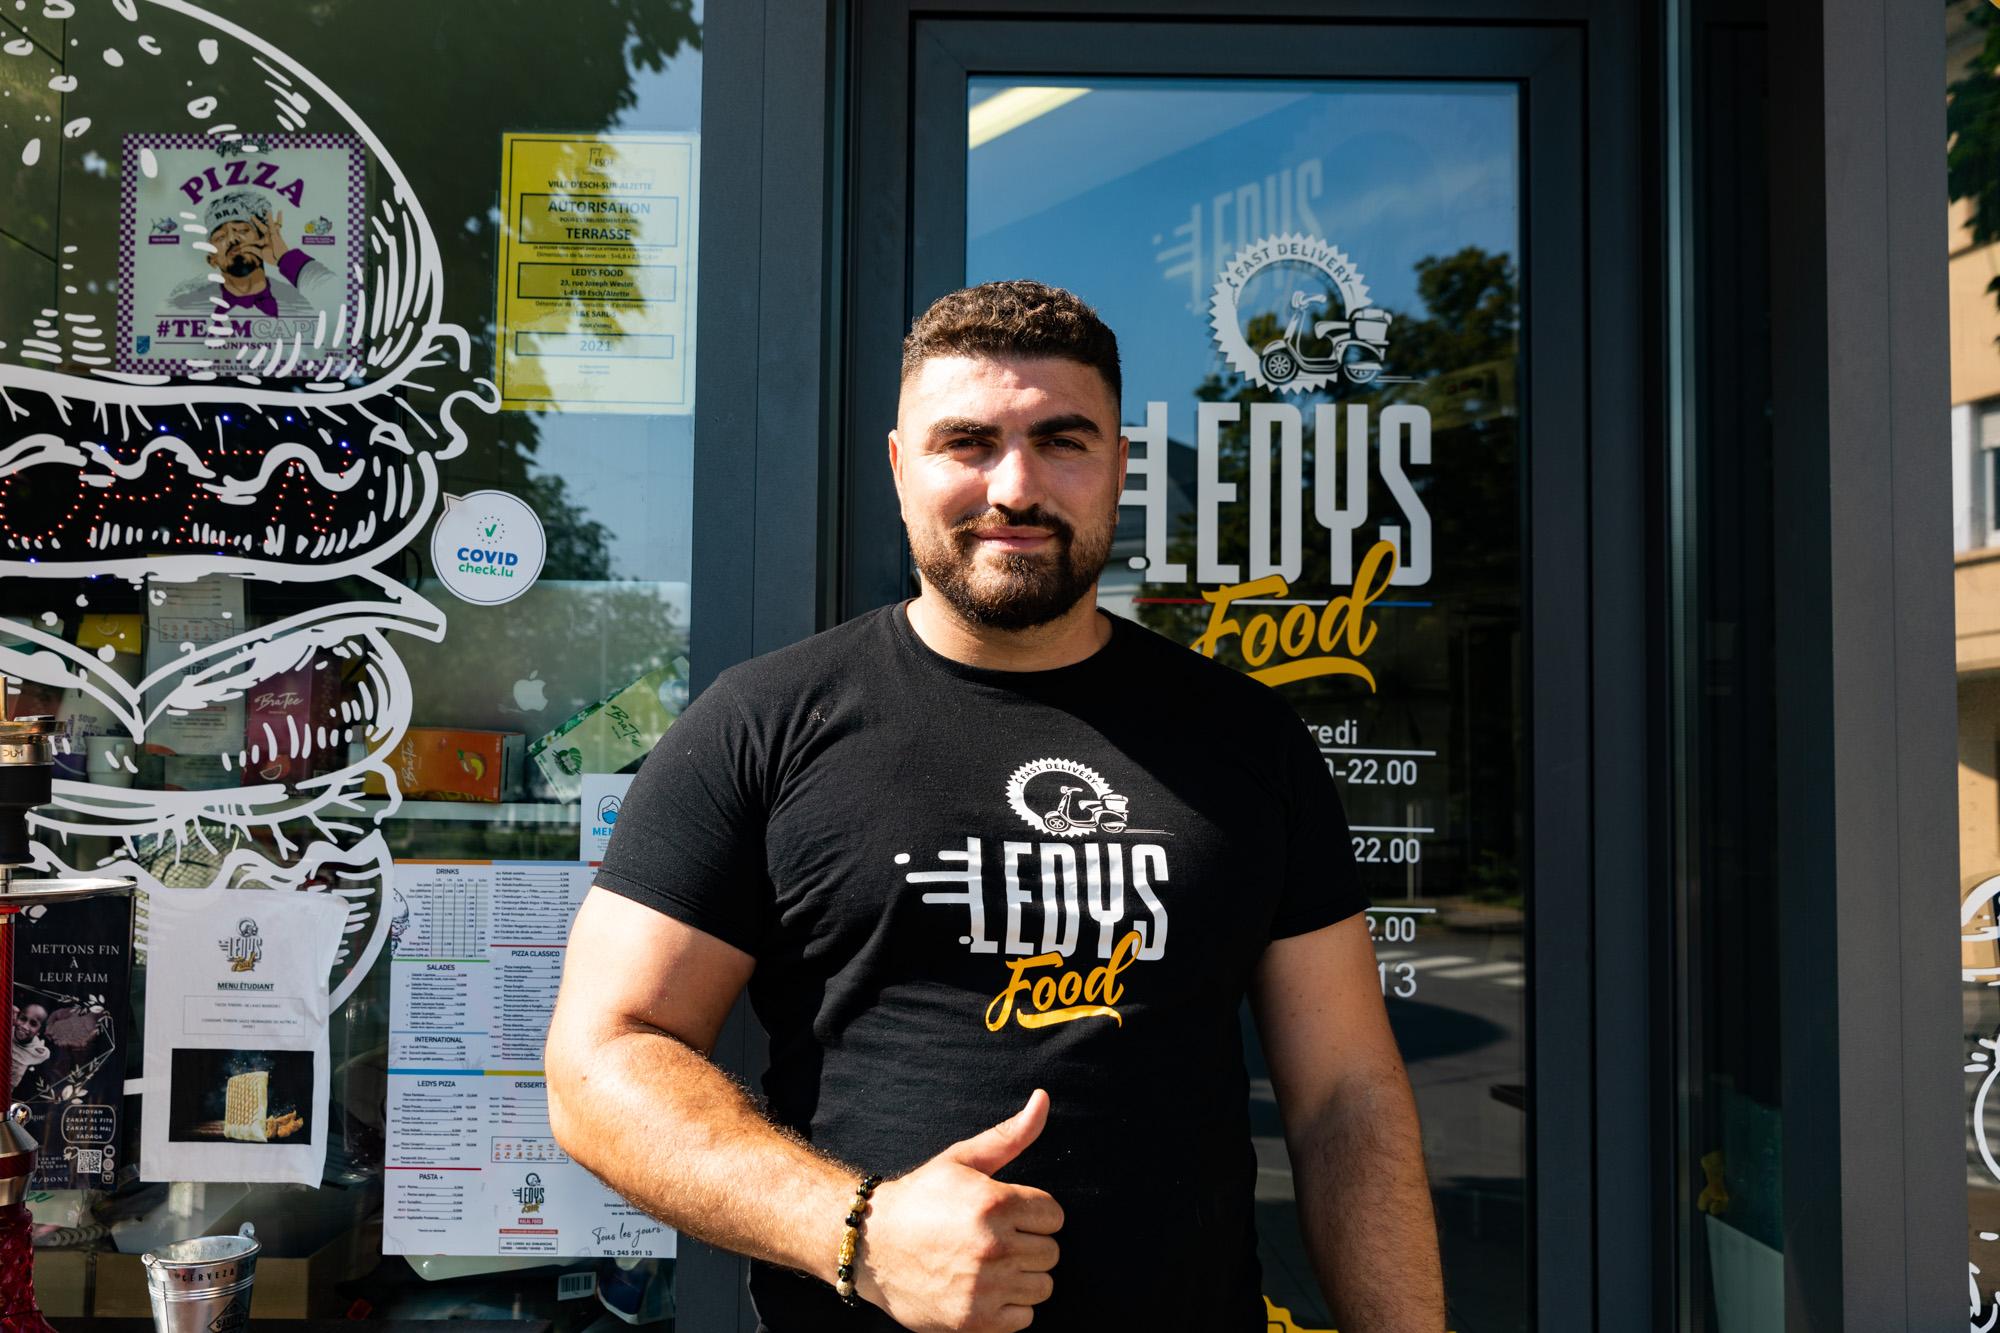 Ledy's Food – Hospitalitéit vum Balkan